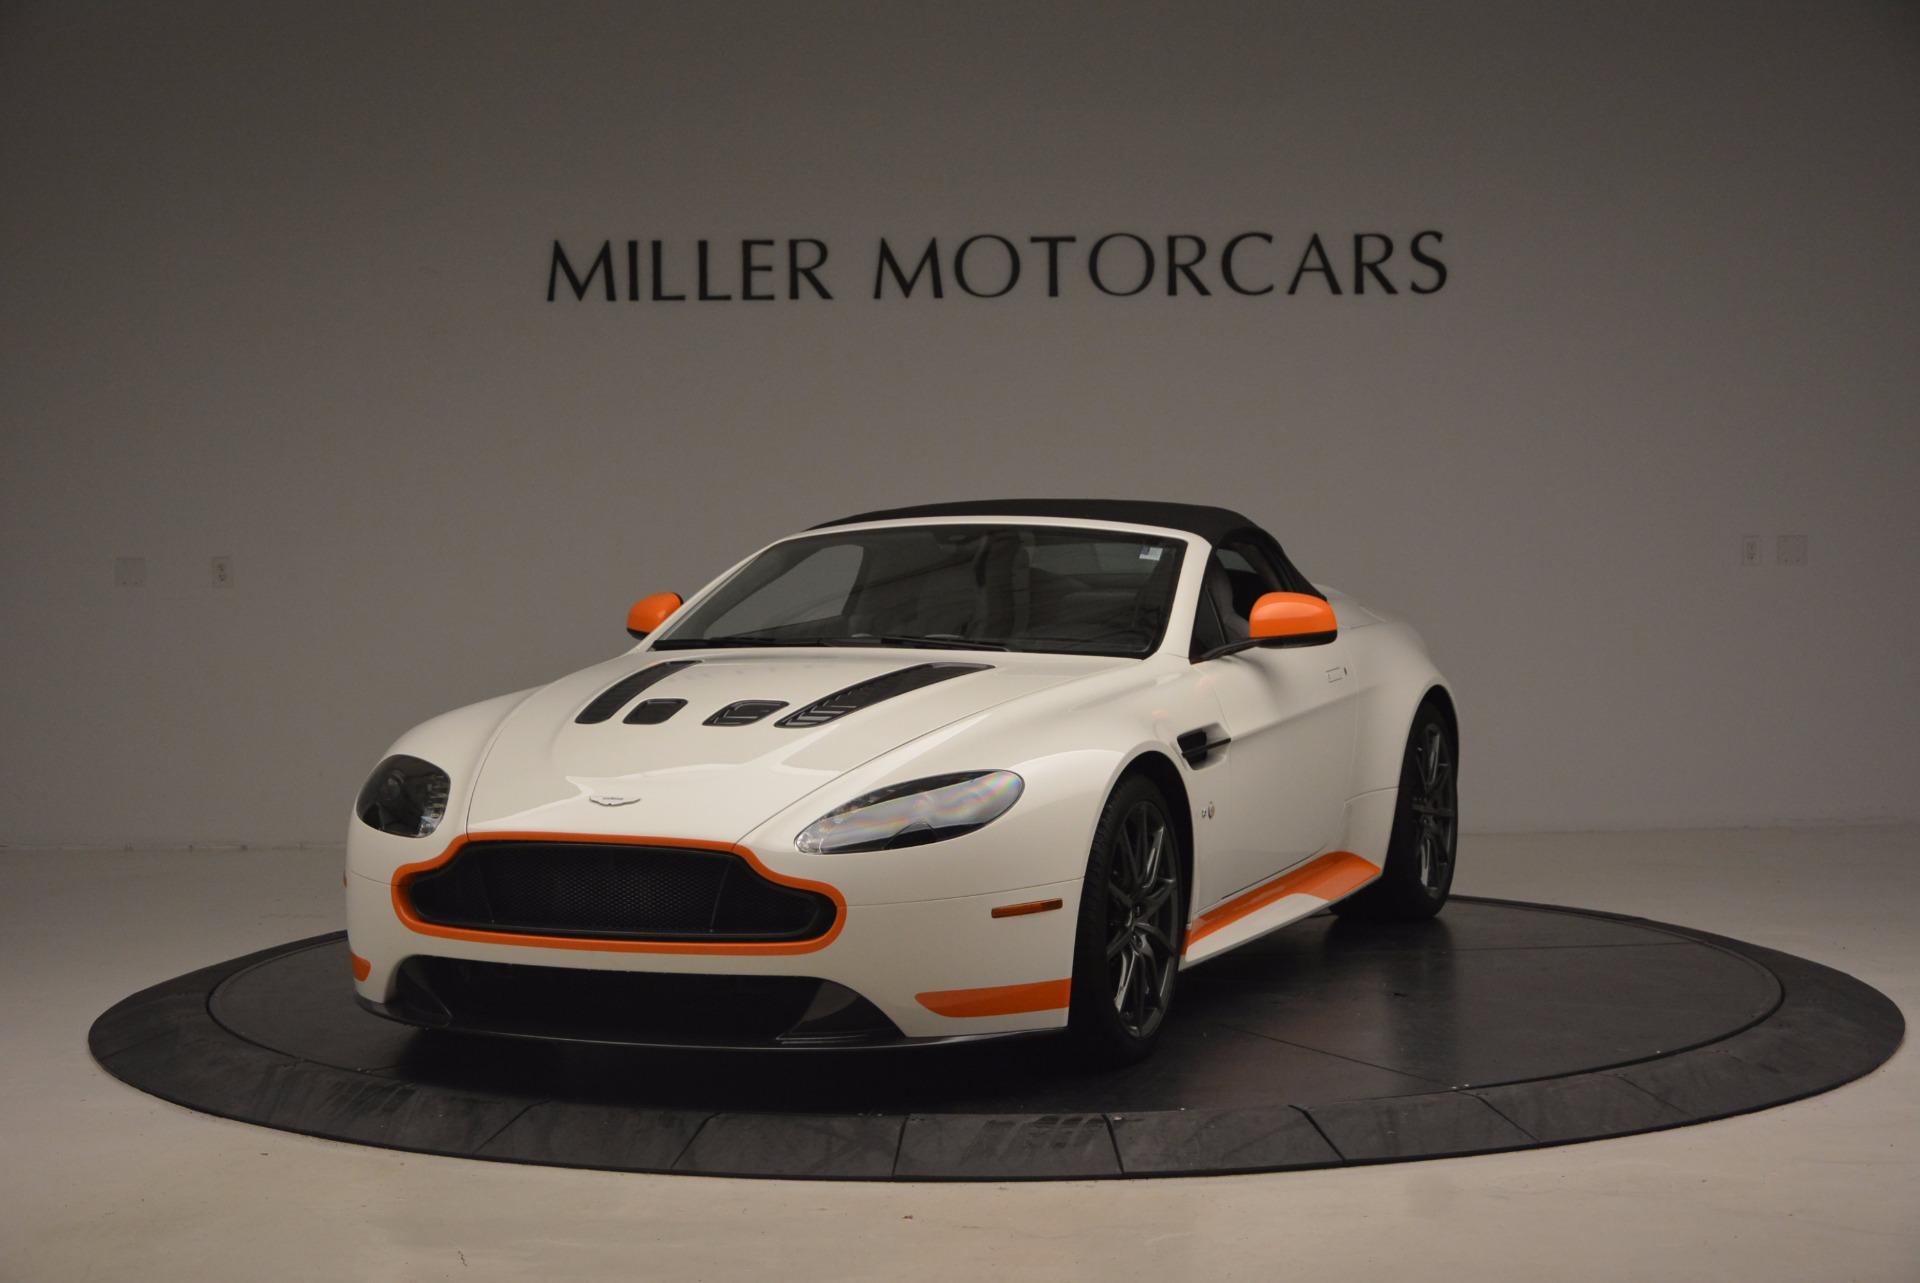 Used 2017 Aston Martin V12 Vantage S Convertible For Sale In Greenwich, CT. Alfa Romeo of Greenwich, 7514 1134_p13